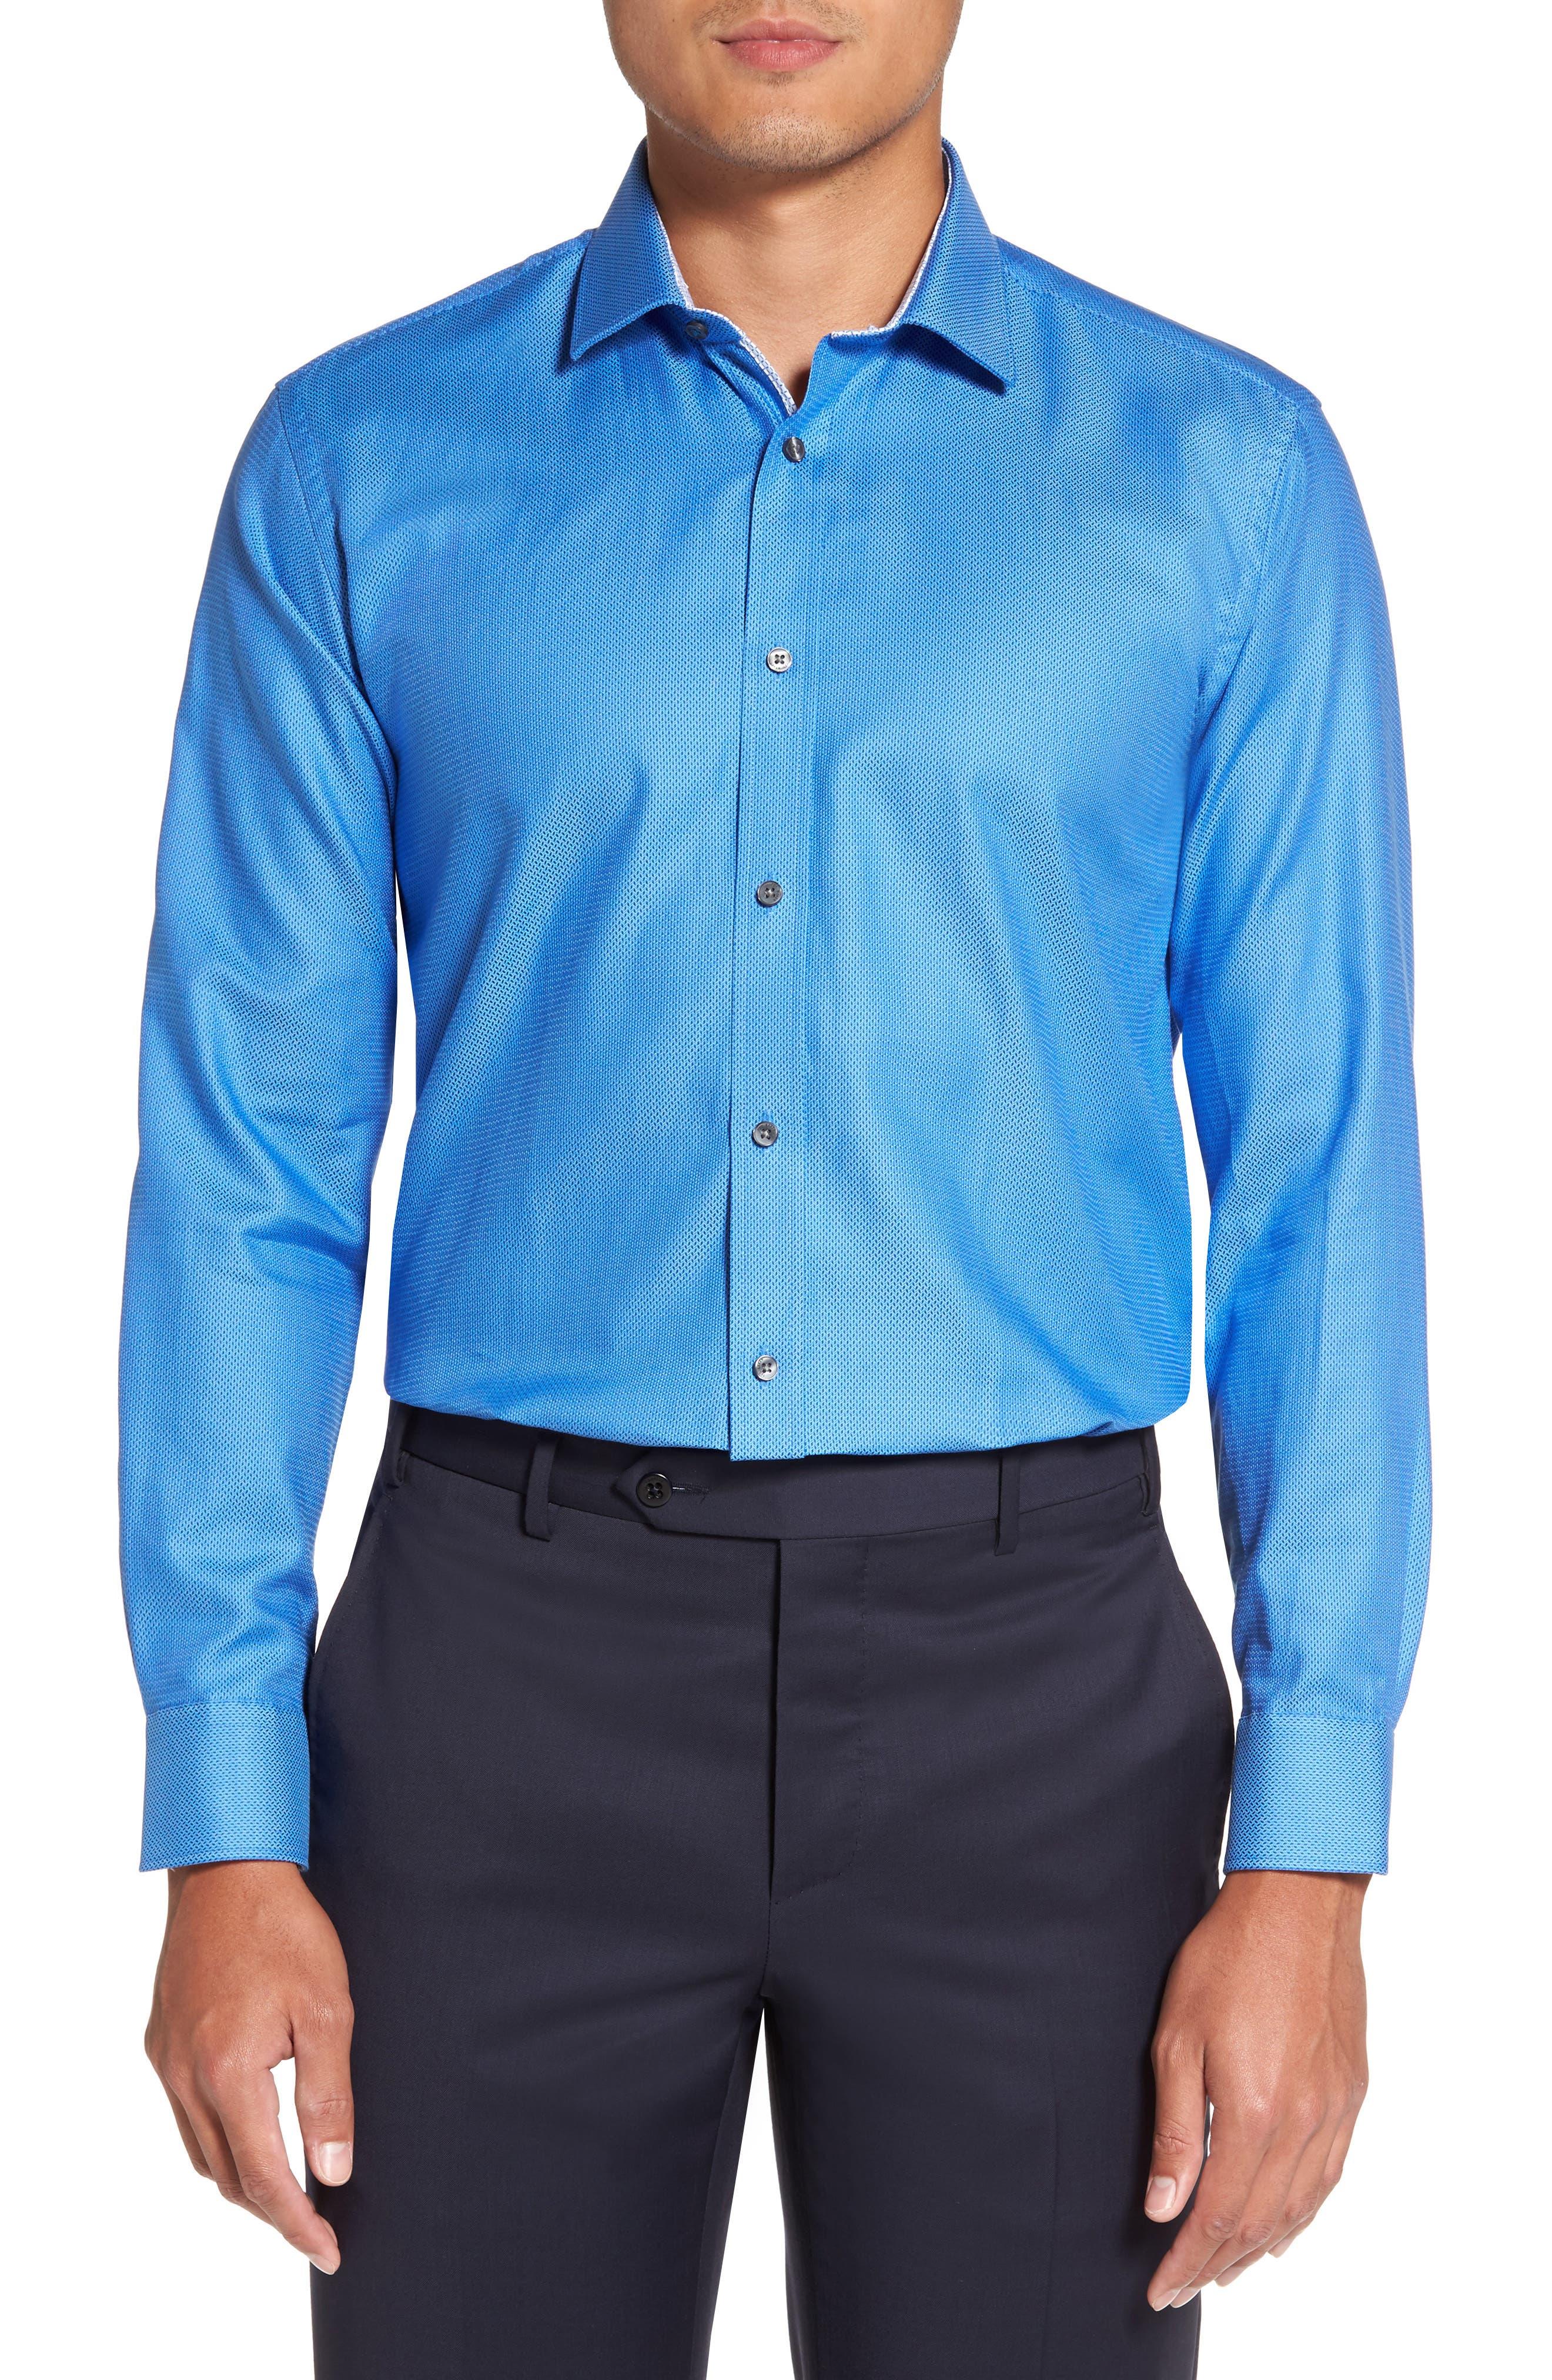 Alternate Image 1 Selected - Ted Baker London Endurance Trim Fit Geometric Dress Shirt